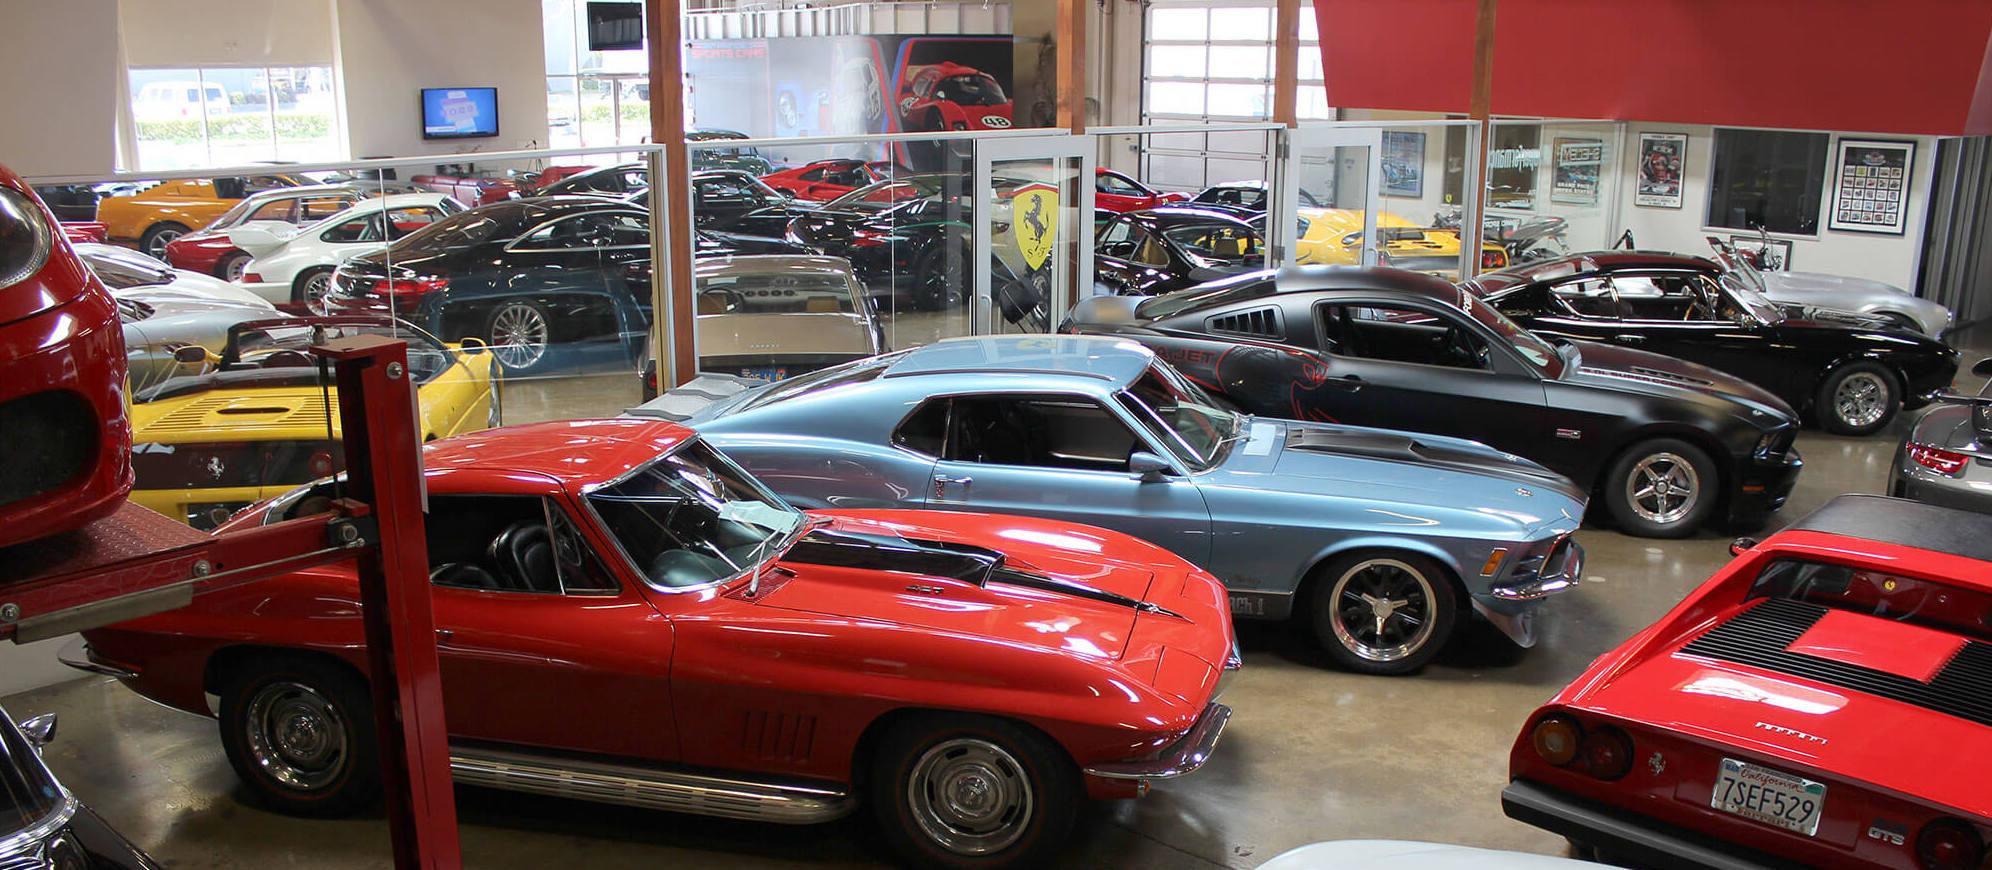 Inventory San Francisco Sports Cars